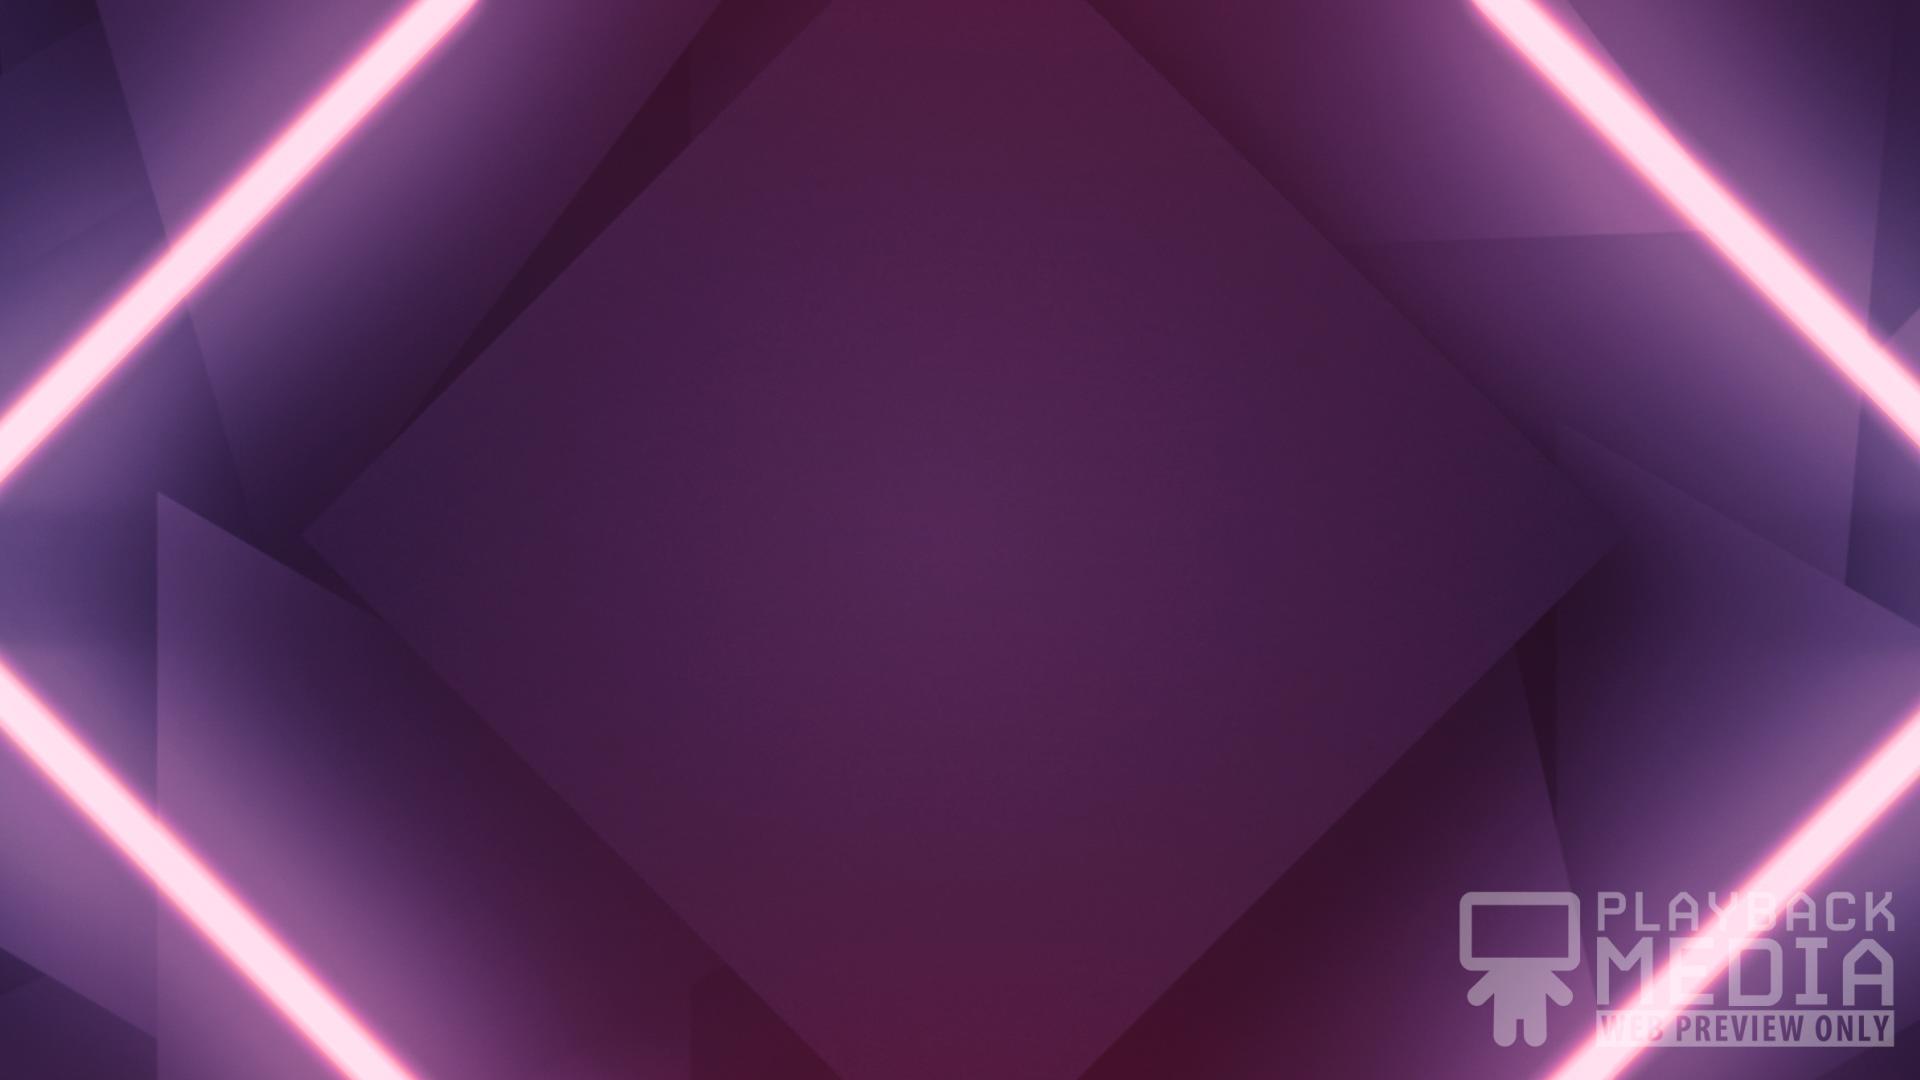 Shifting Geometry Purple Still Background 1920x1080